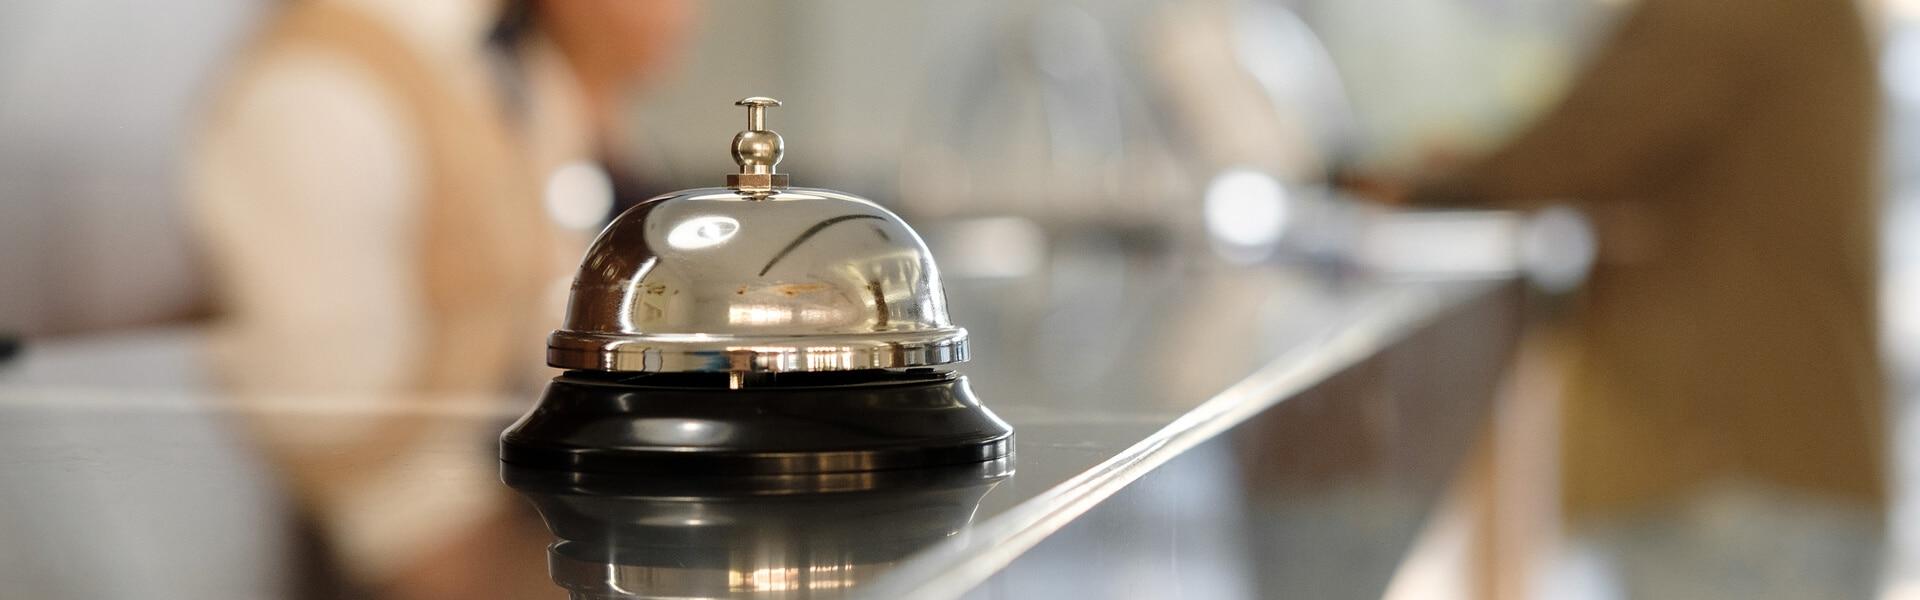 Hotel_AdobeStock_234636298_1920x600px